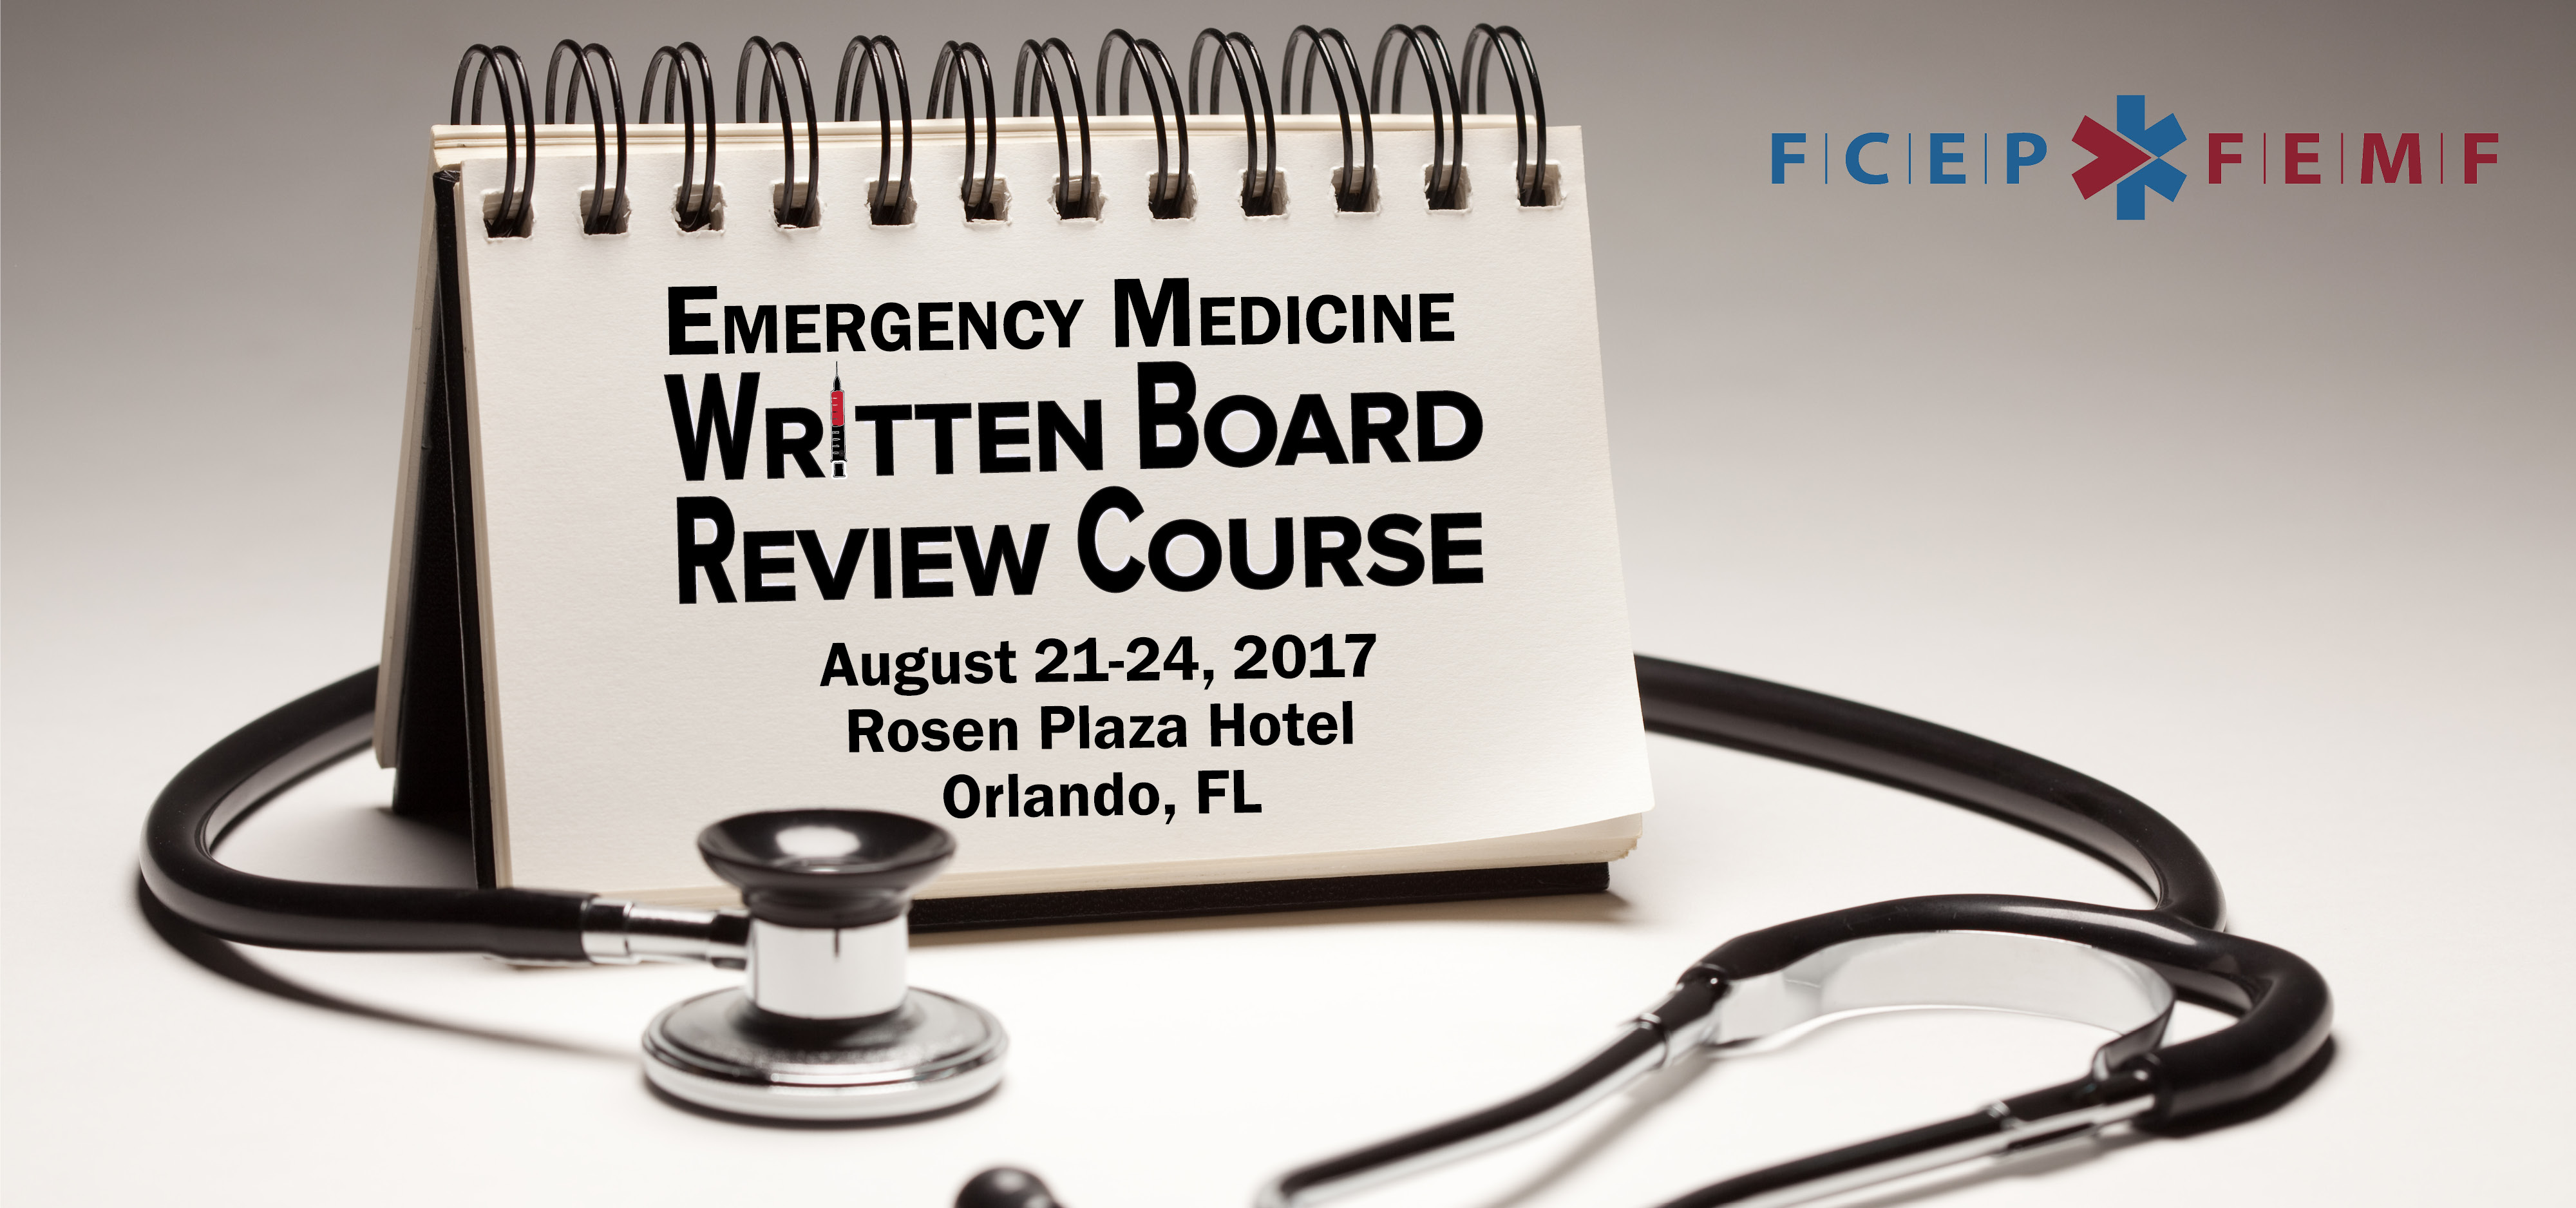 Florida's Emergency Medicine Written Board Review Course 2017